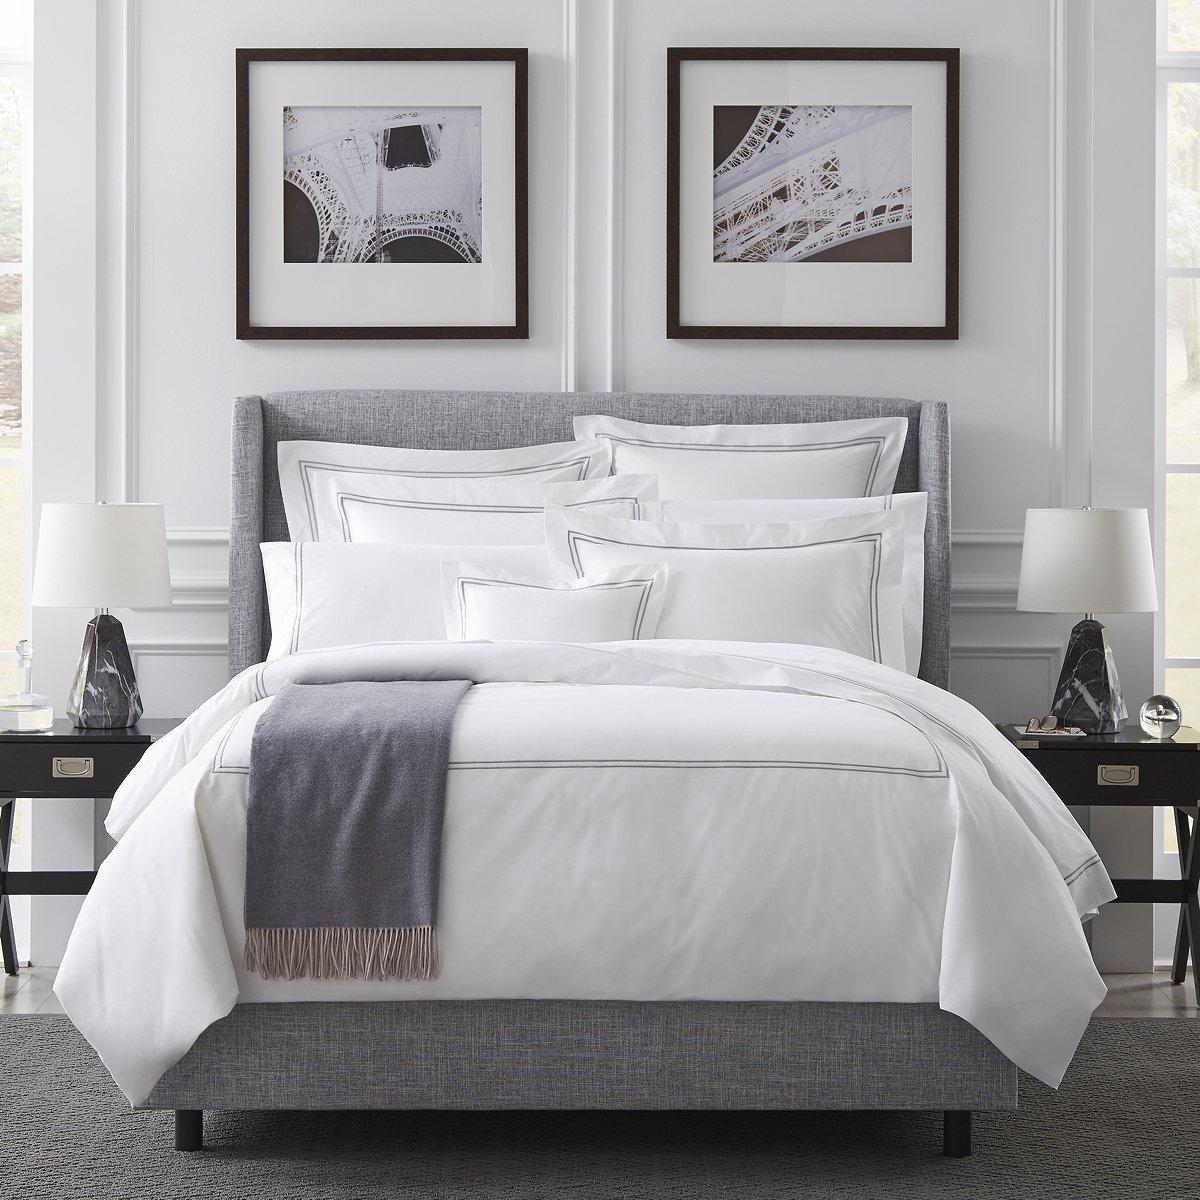 Grande Hotel by Sferra - King Flat Sheet 114x114 (White/Aqua) by Sferra